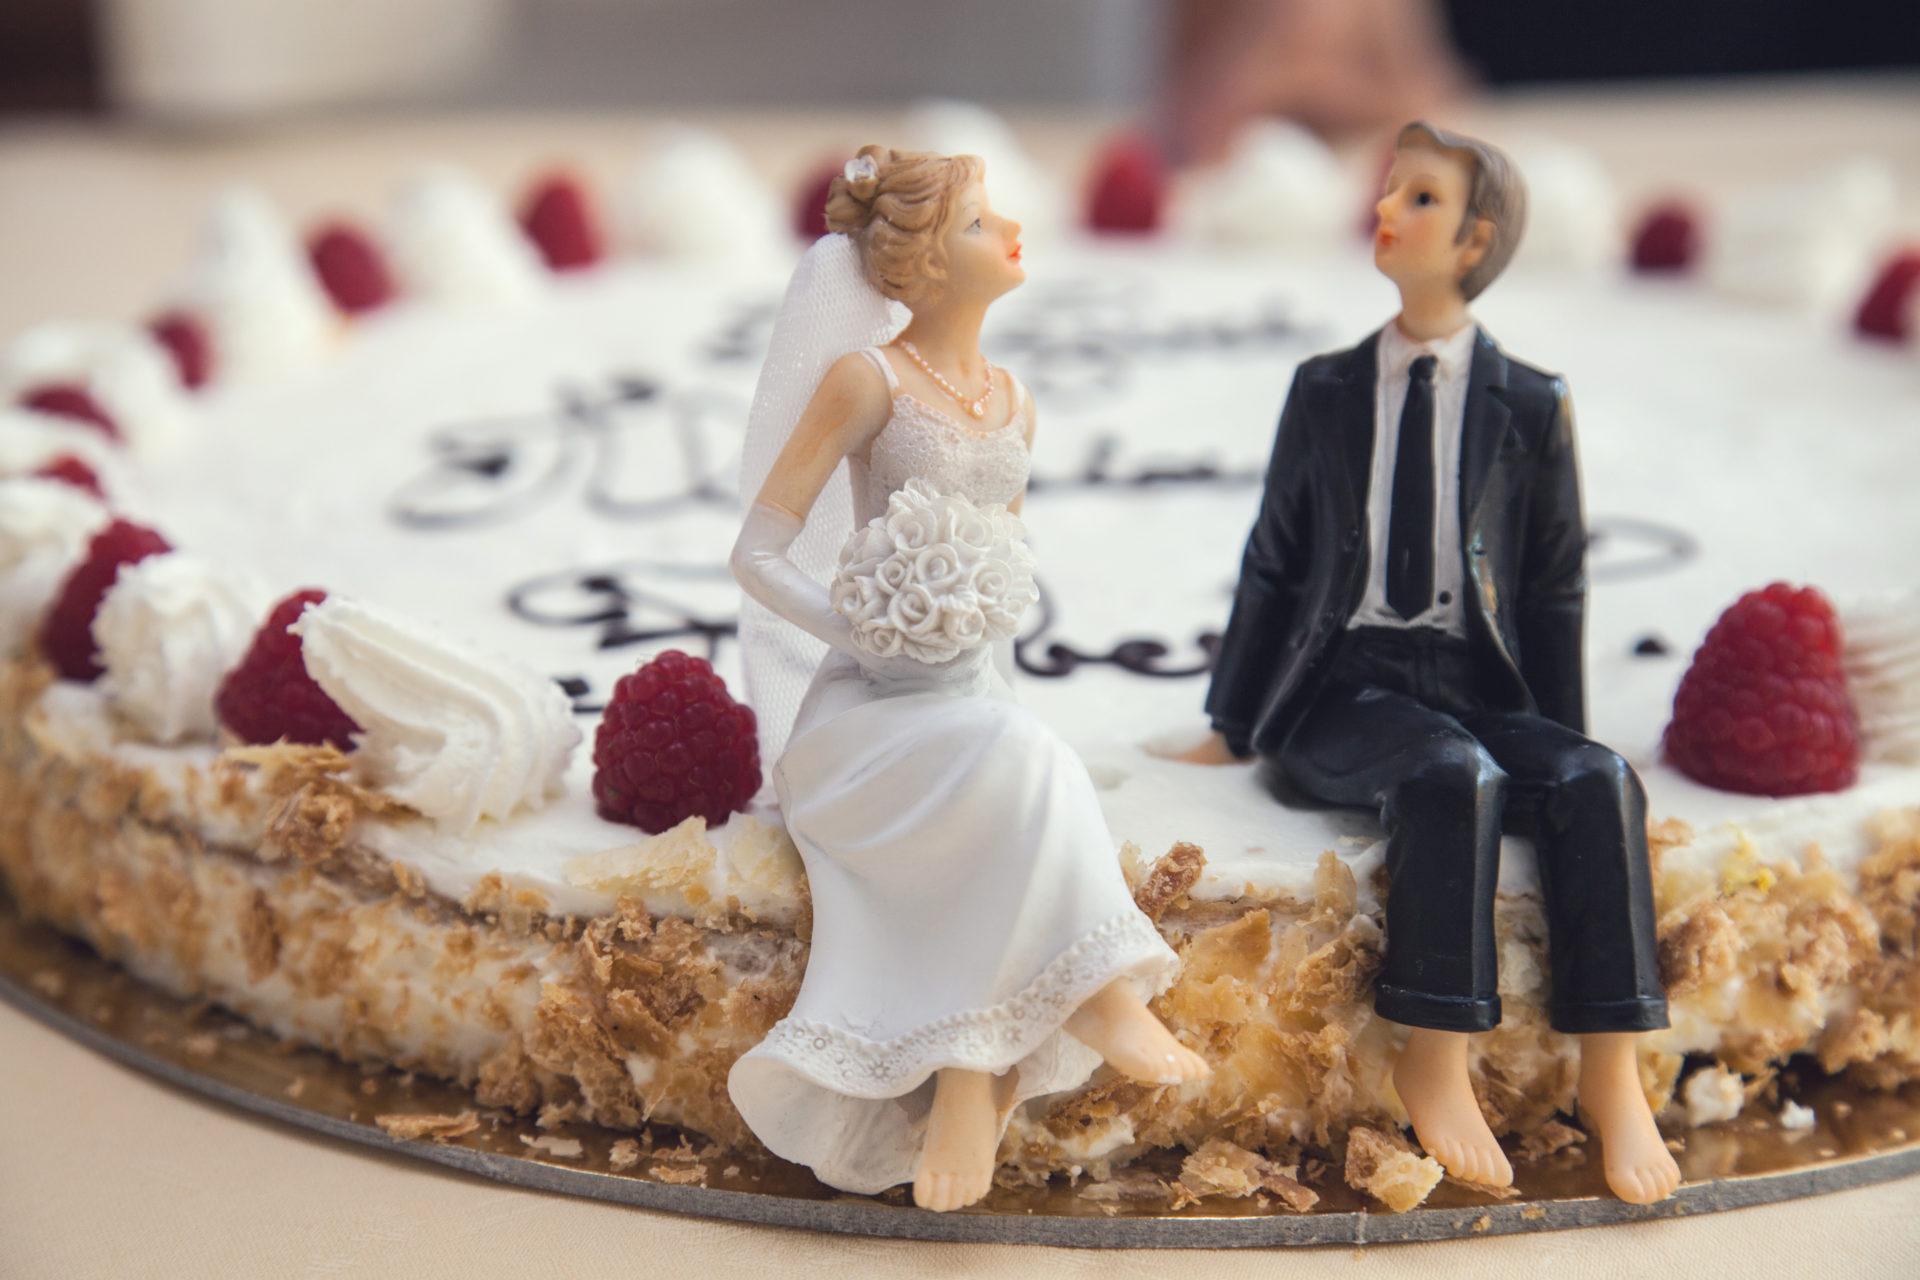 The Weirdest wedding songs